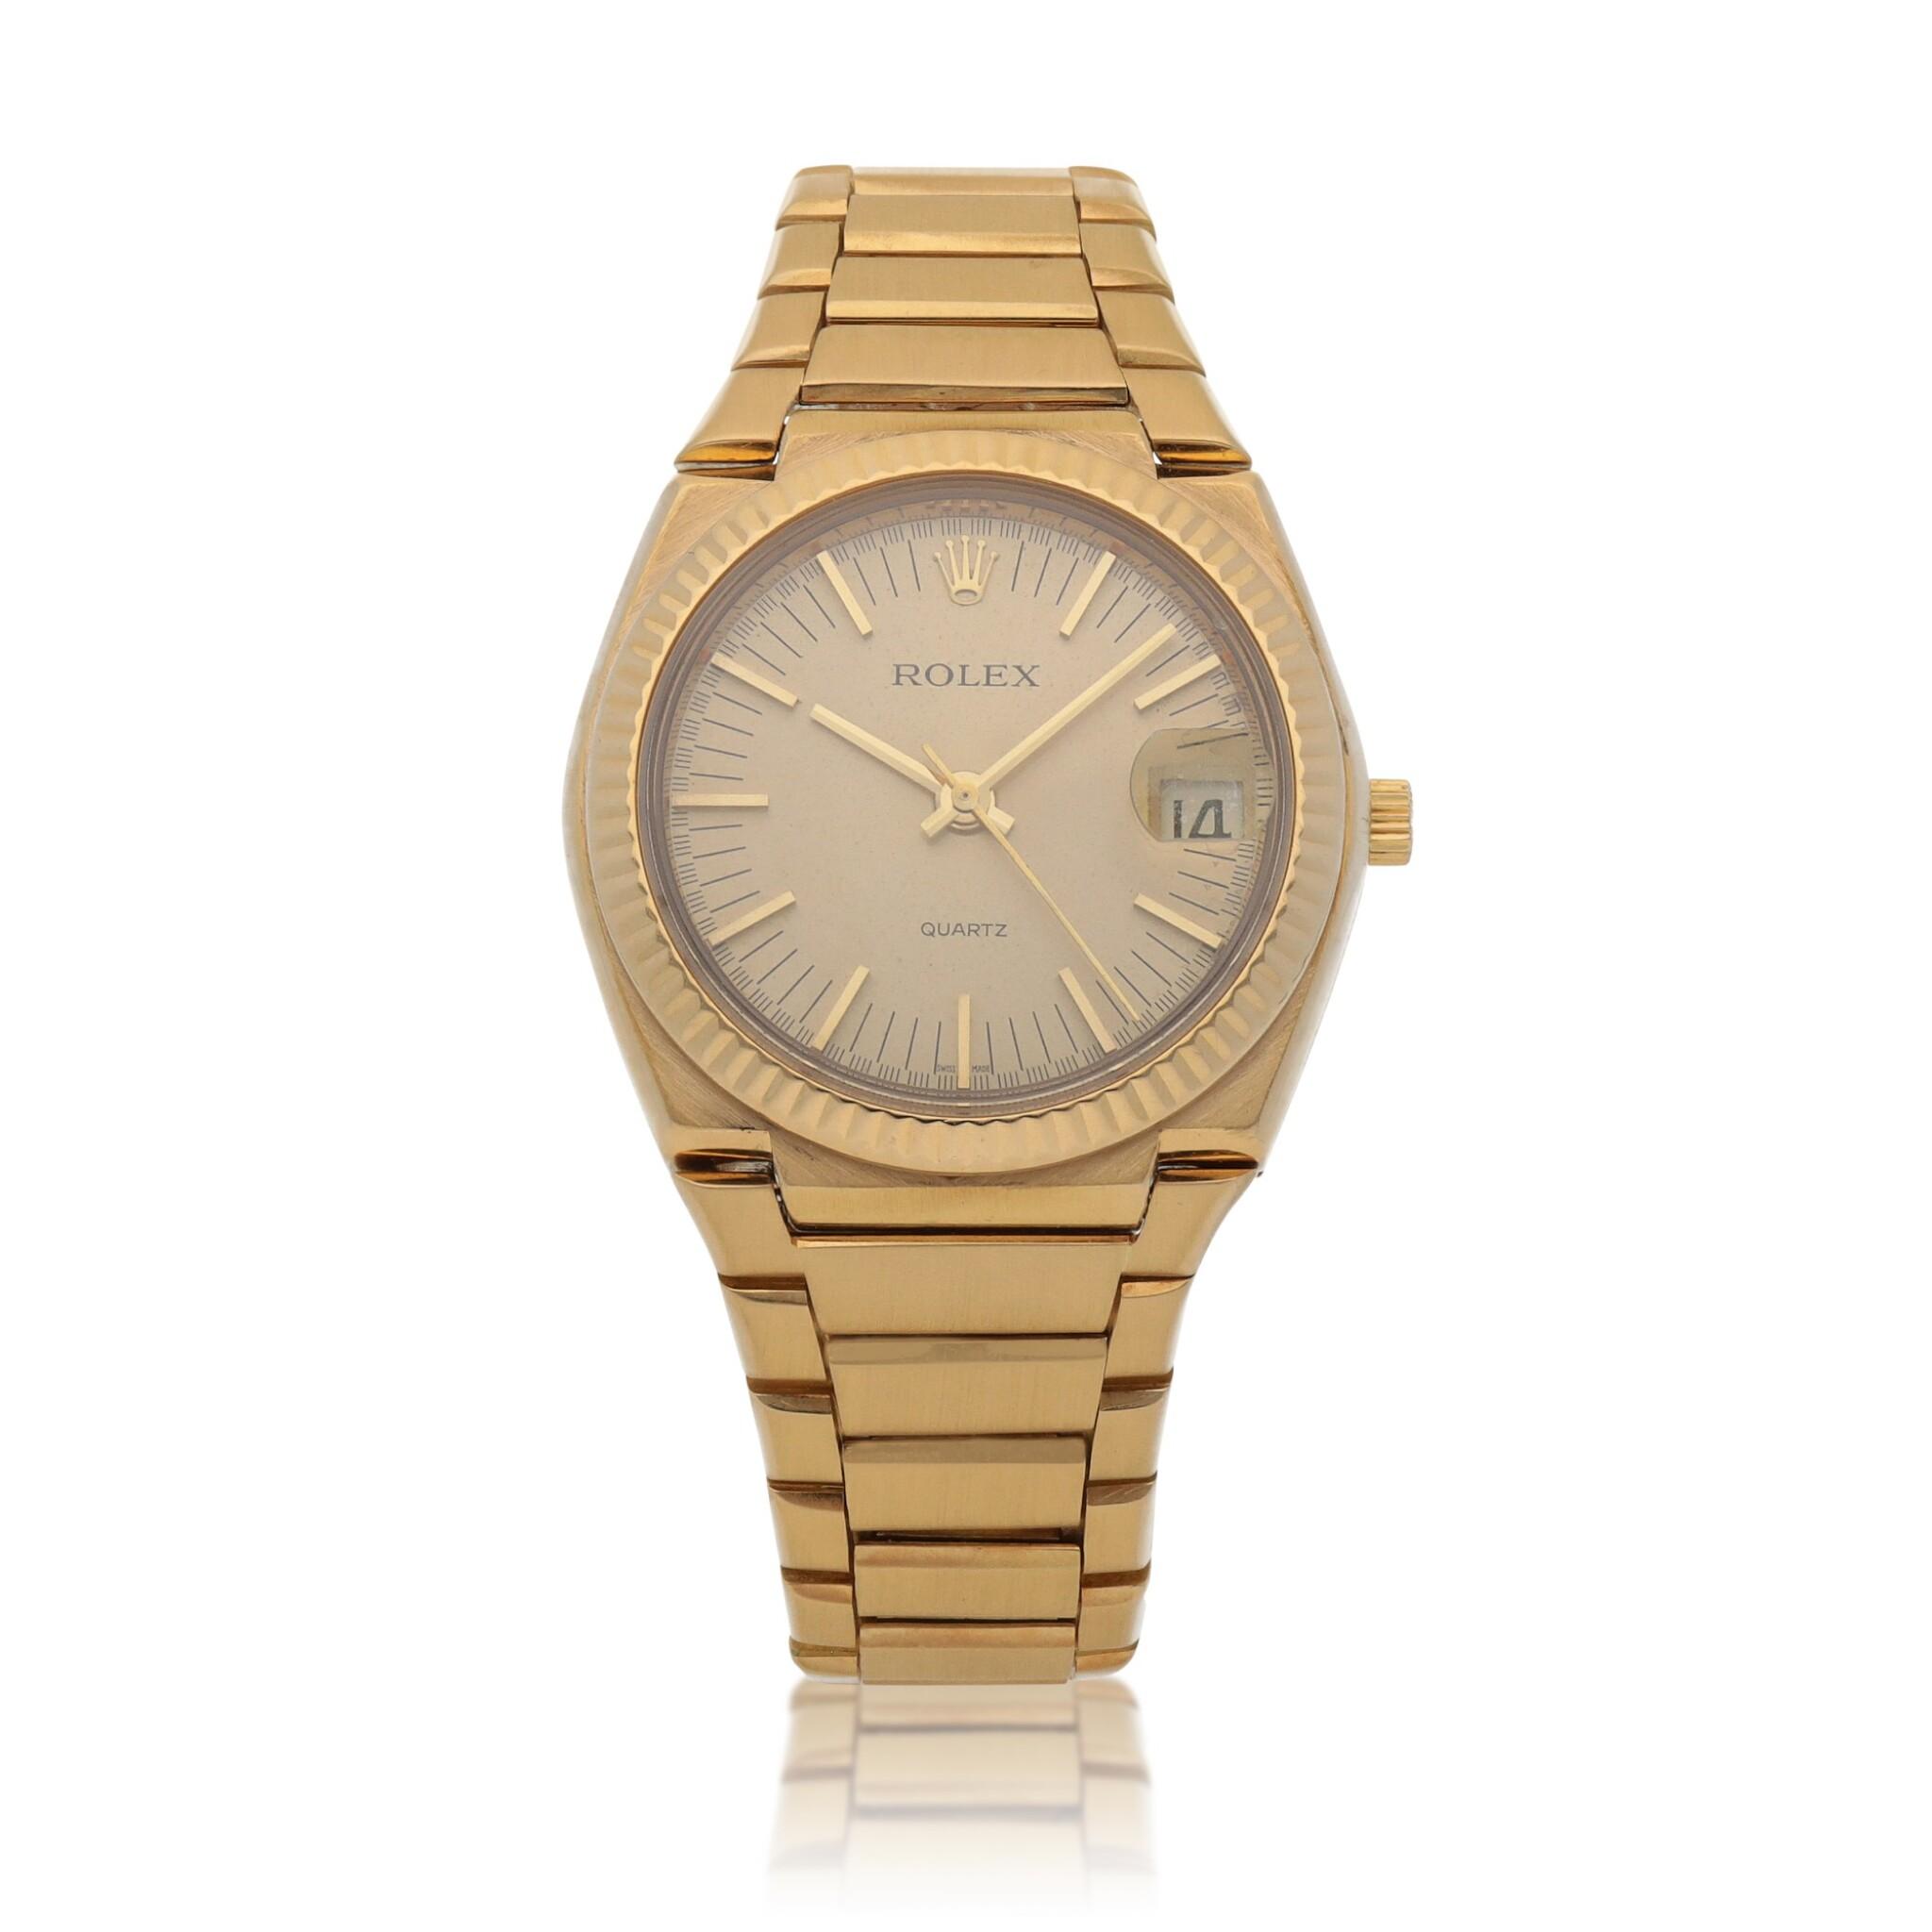 View full screen - View 1 of Lot 428. 'The Texan' Quartz, Ref. 5100 BETA 21 Yellow gold wristwatch with date and bracelet Circa 1970   勞力士 5100 BETA 21型號「'The Texan' Quartz」黃金鍊帶腕錶備日期顯示,年份約1970.